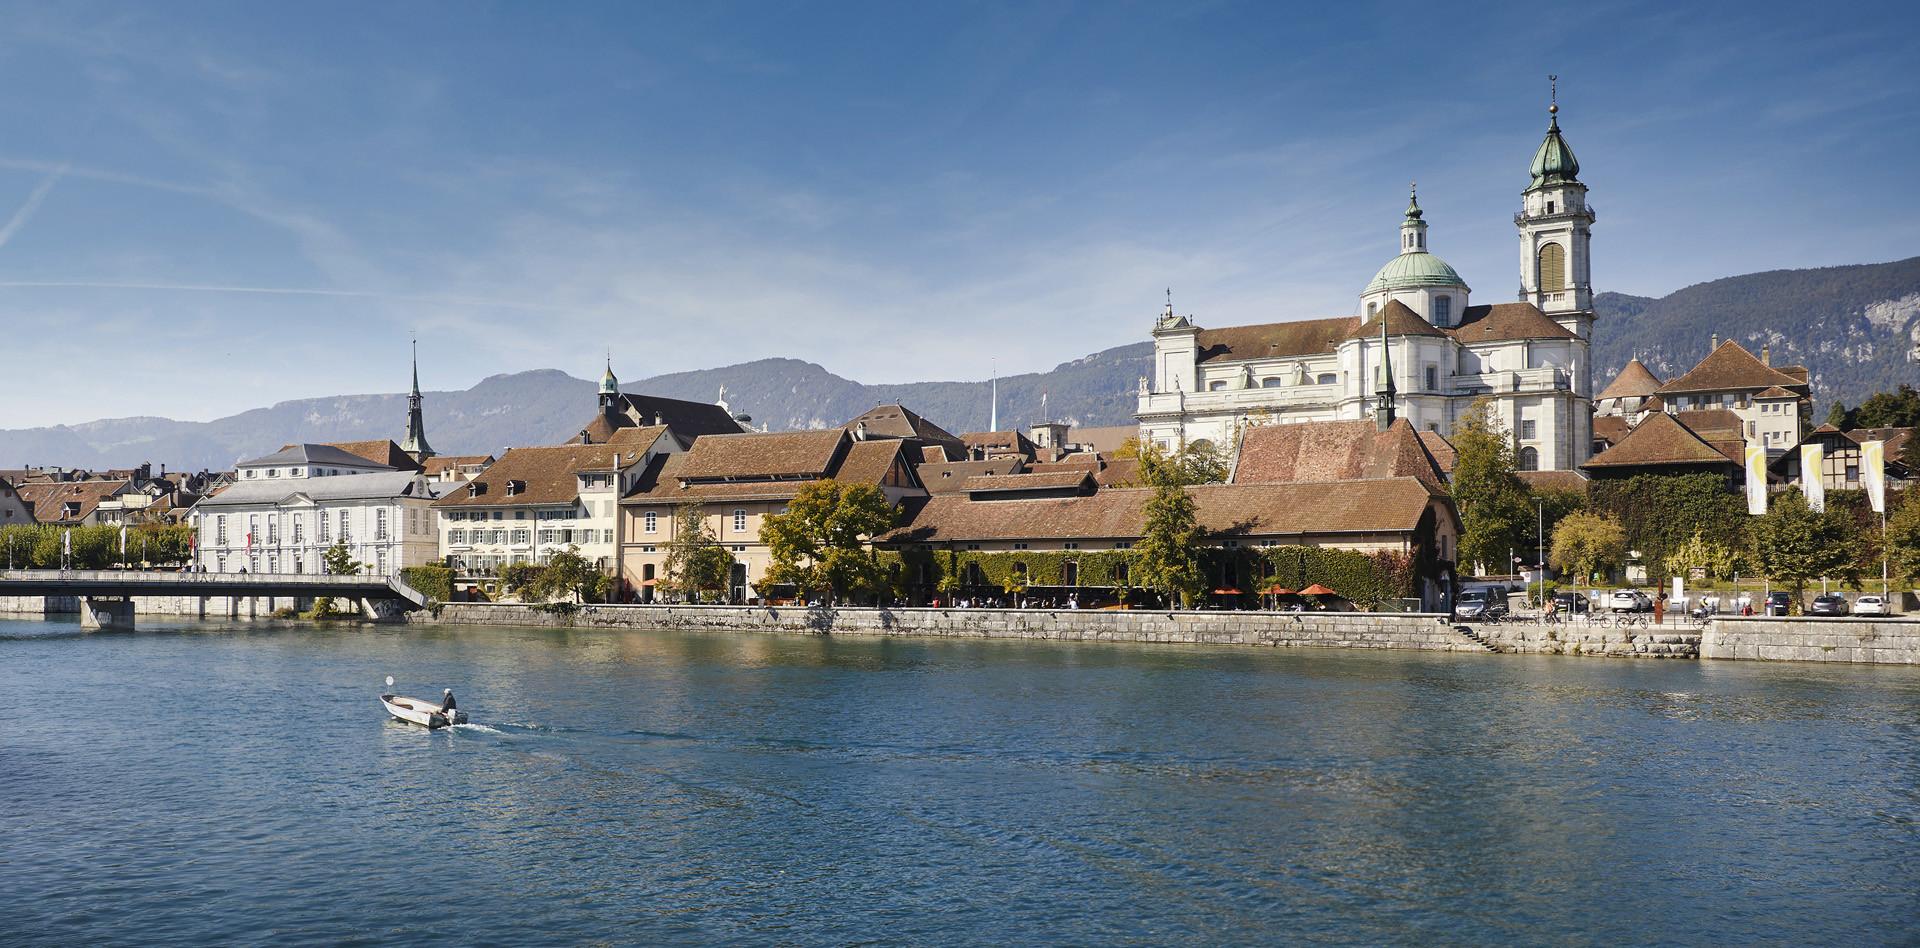 Warum Solothurn   Solothurn Tourismus